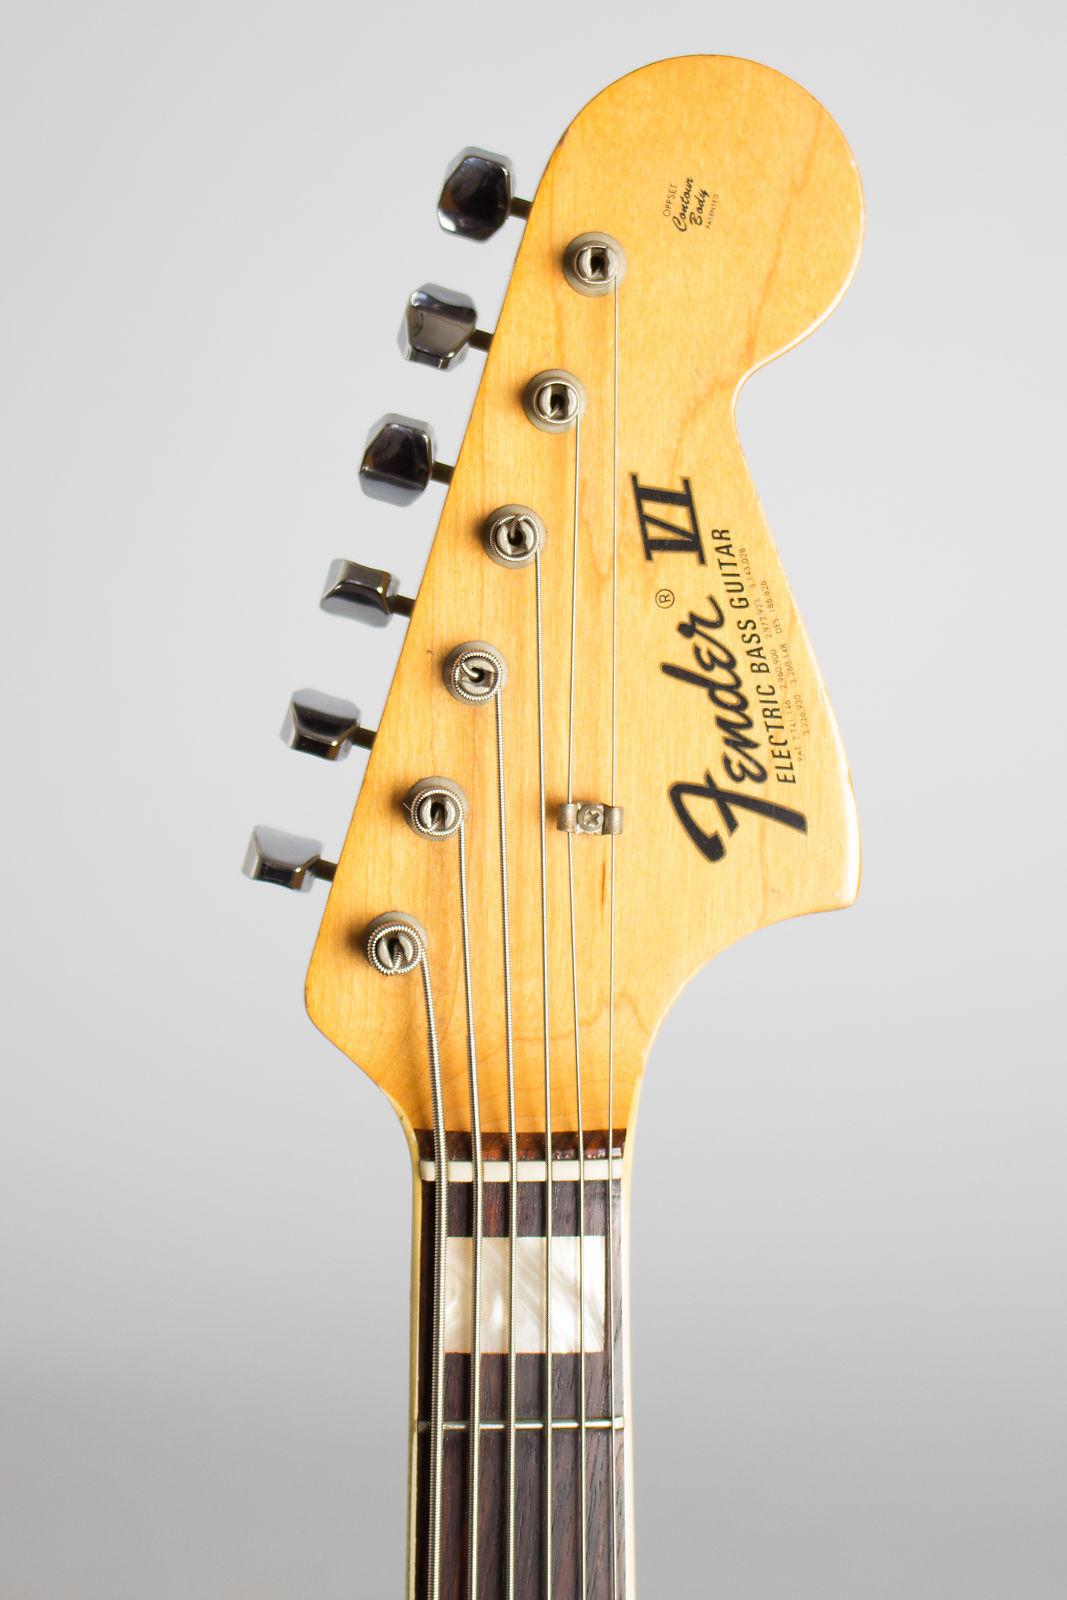 Fender  Bass VI Electric 6-String Bass Guitar (1971), ser. #346160, black hard shell case.